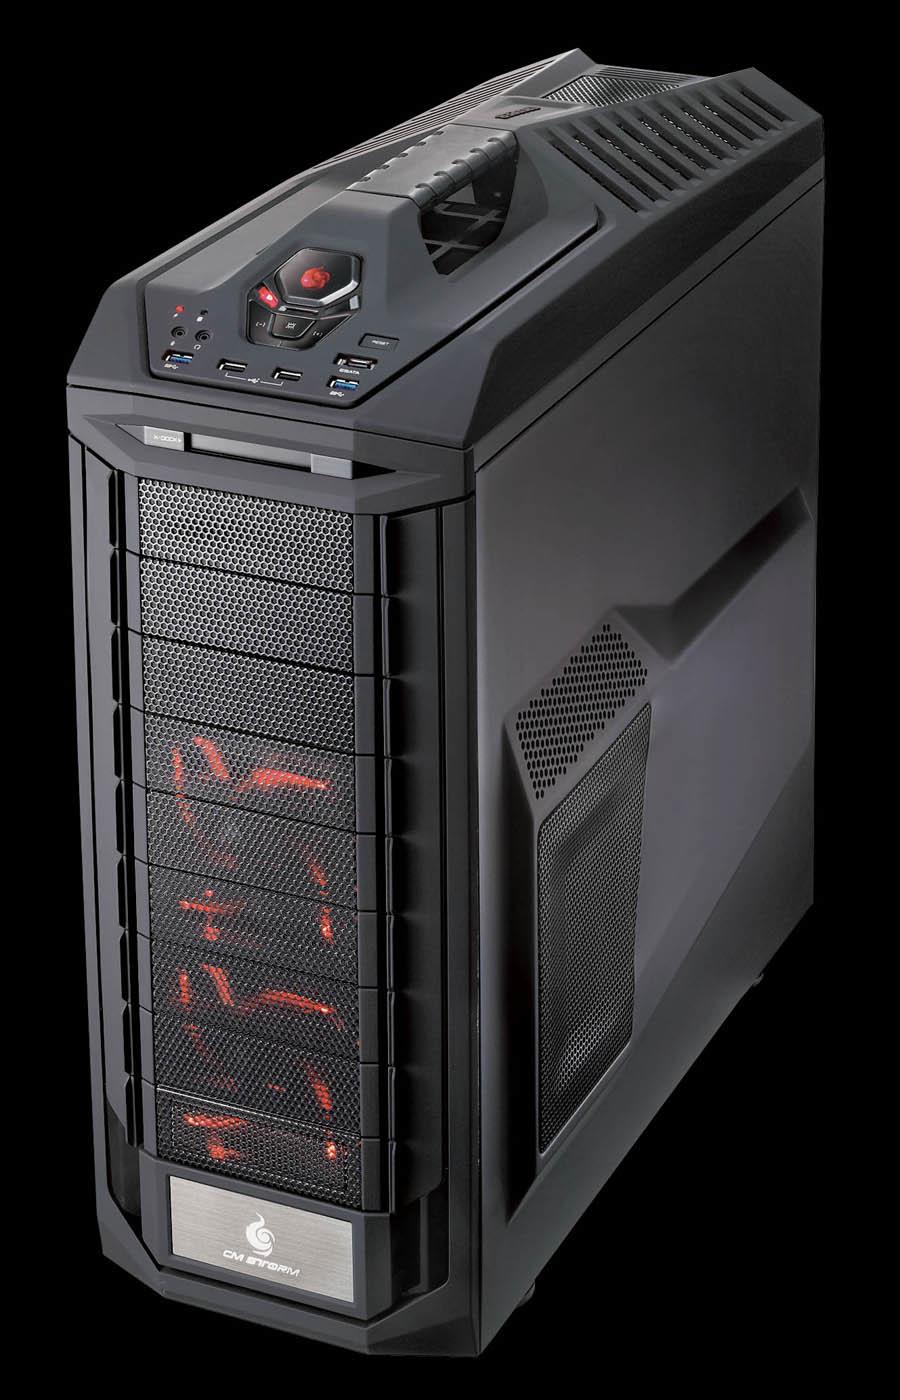 Cooler Master CM Storm Trooper - Computer Cases - Computer Components